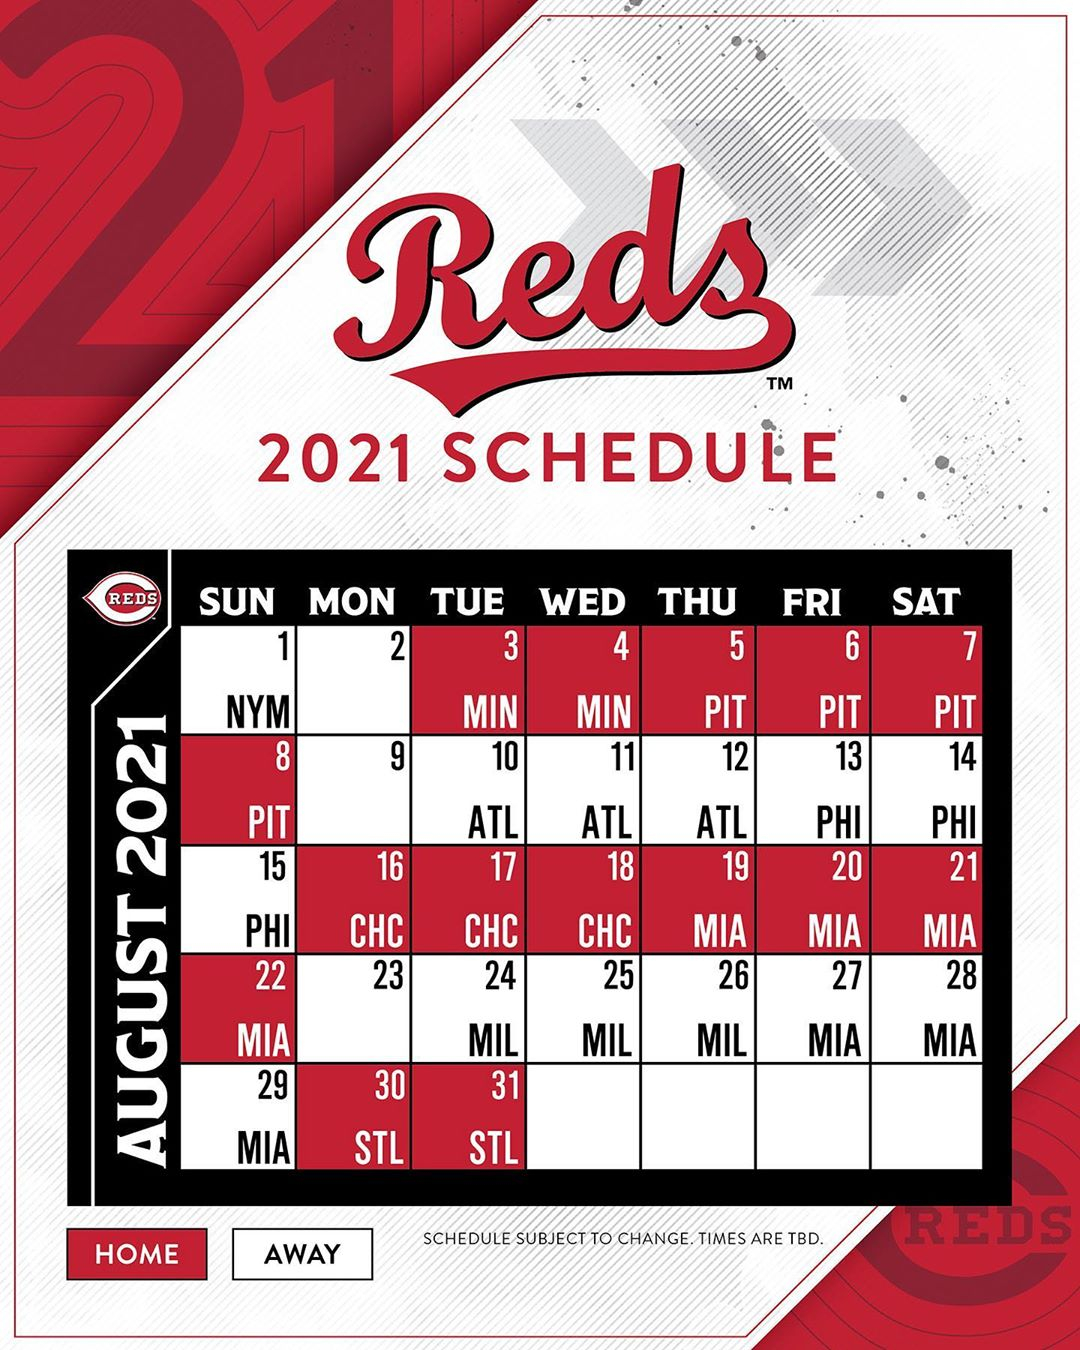 Cincinnati Reds The 2021 Reds Schedule Is Here Raw